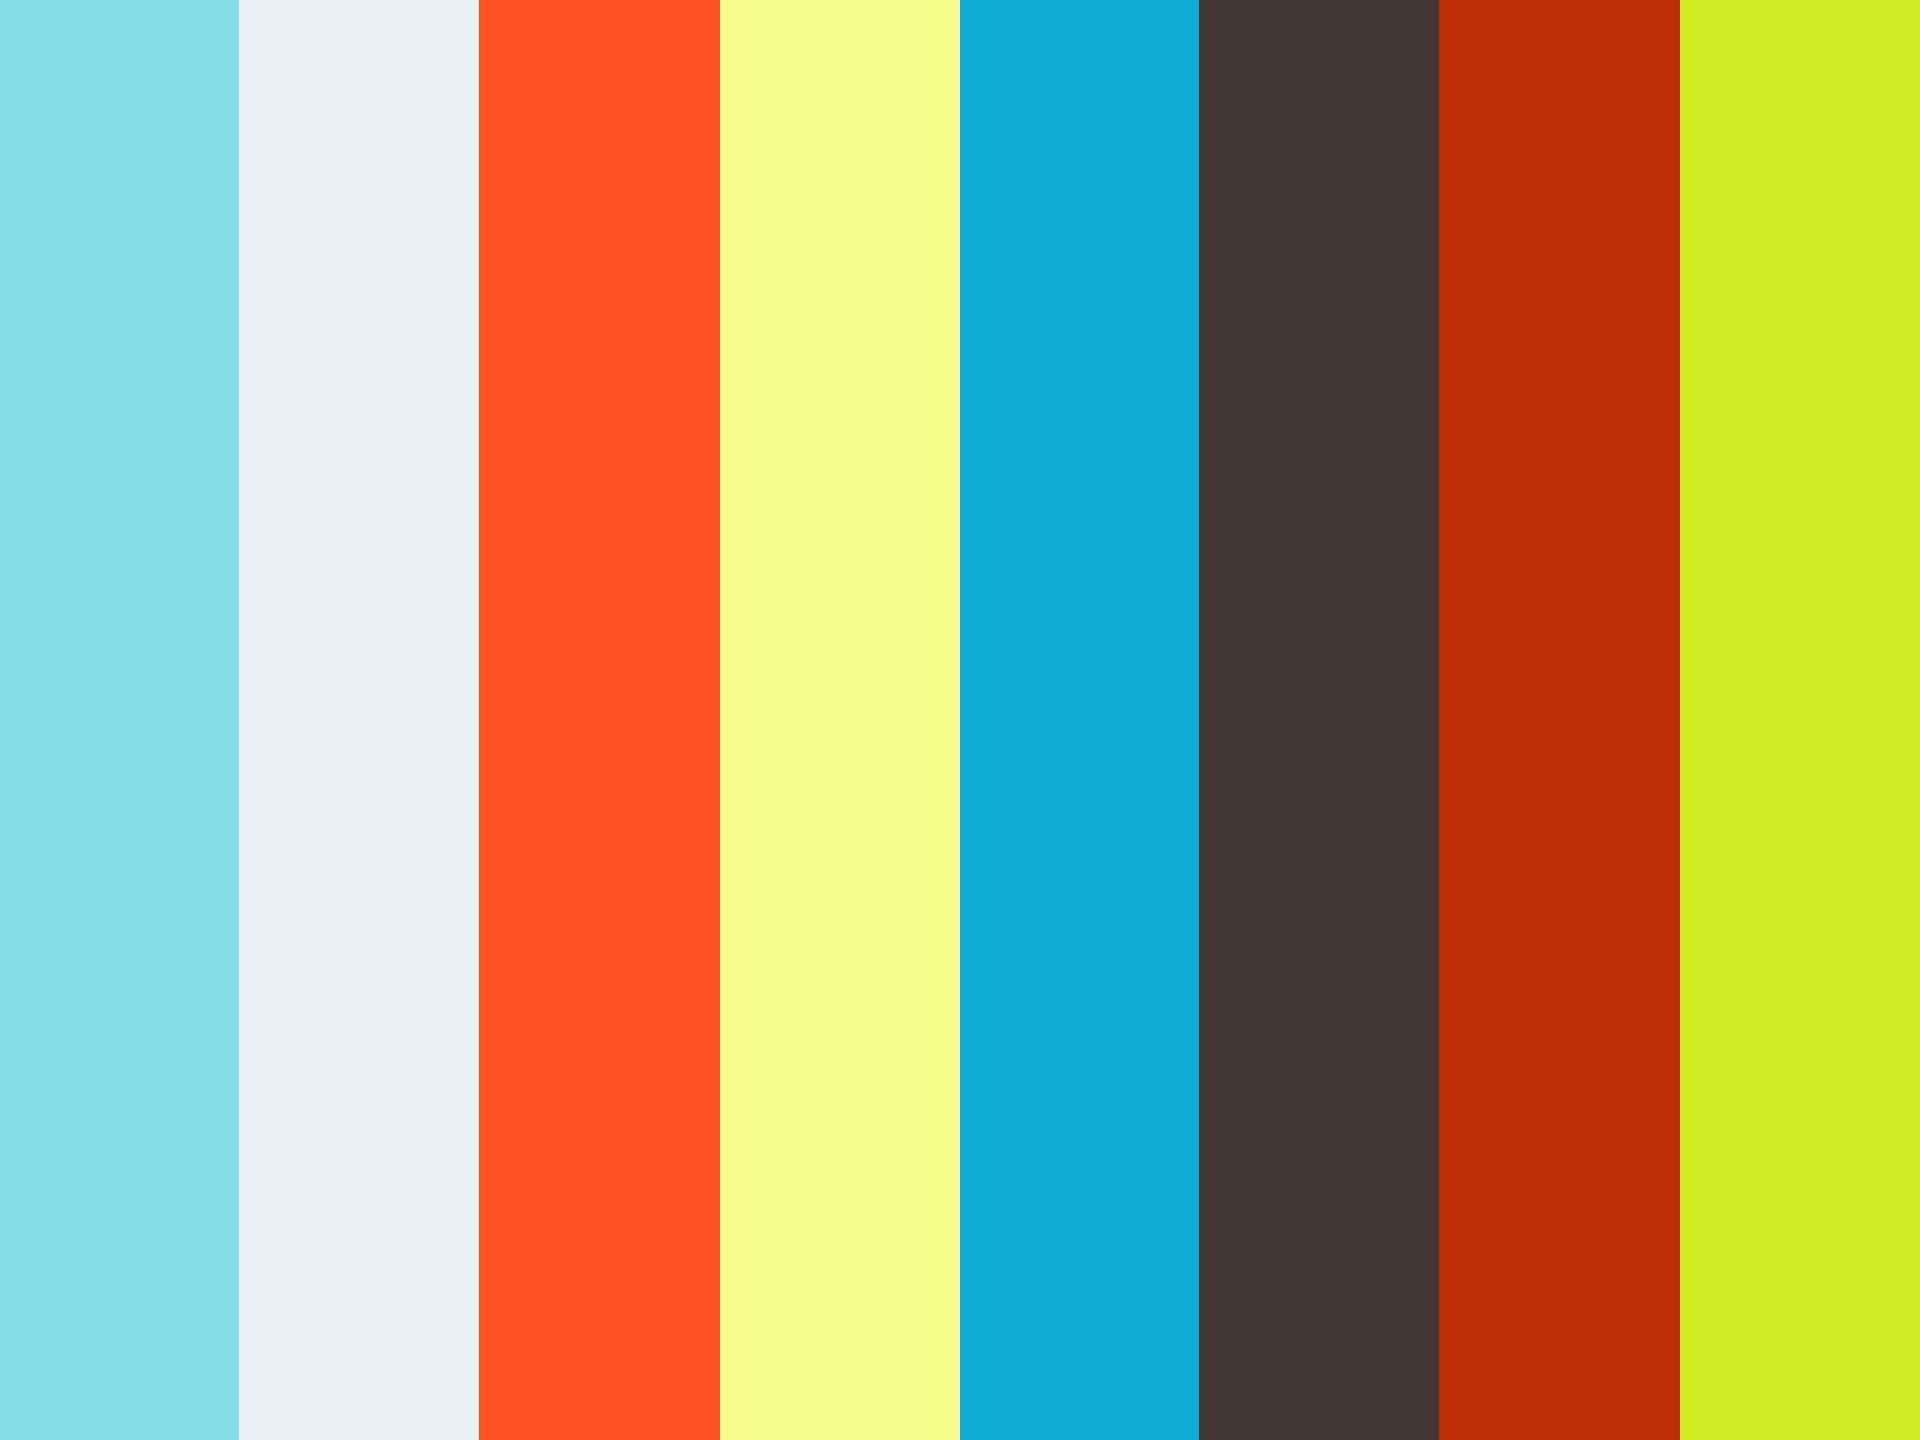 Autismo: de azul a mil colores